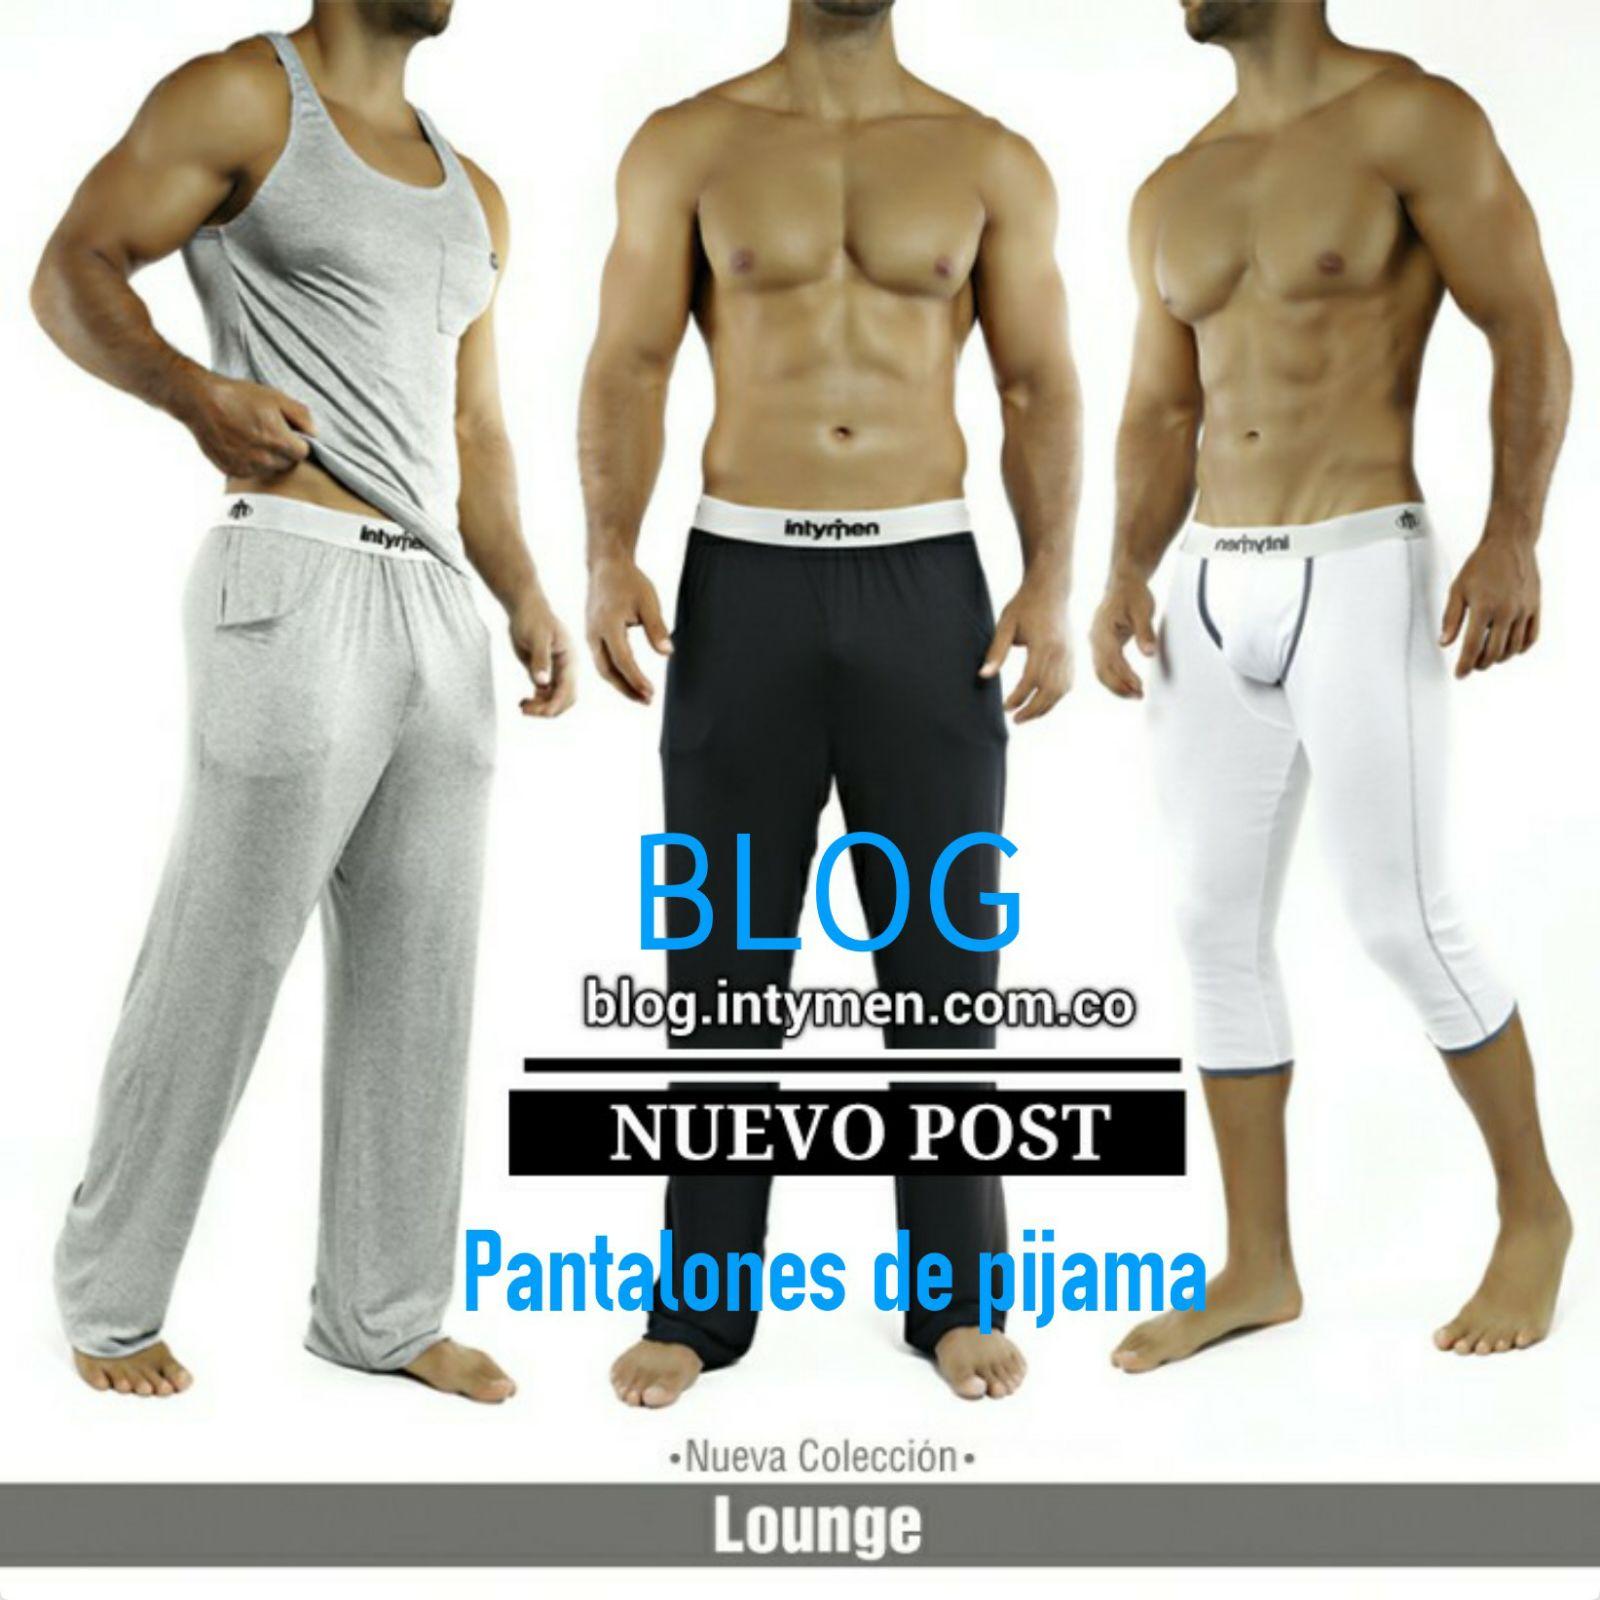 pijamas hombres, ropa interior masculina, pijamas masculinas